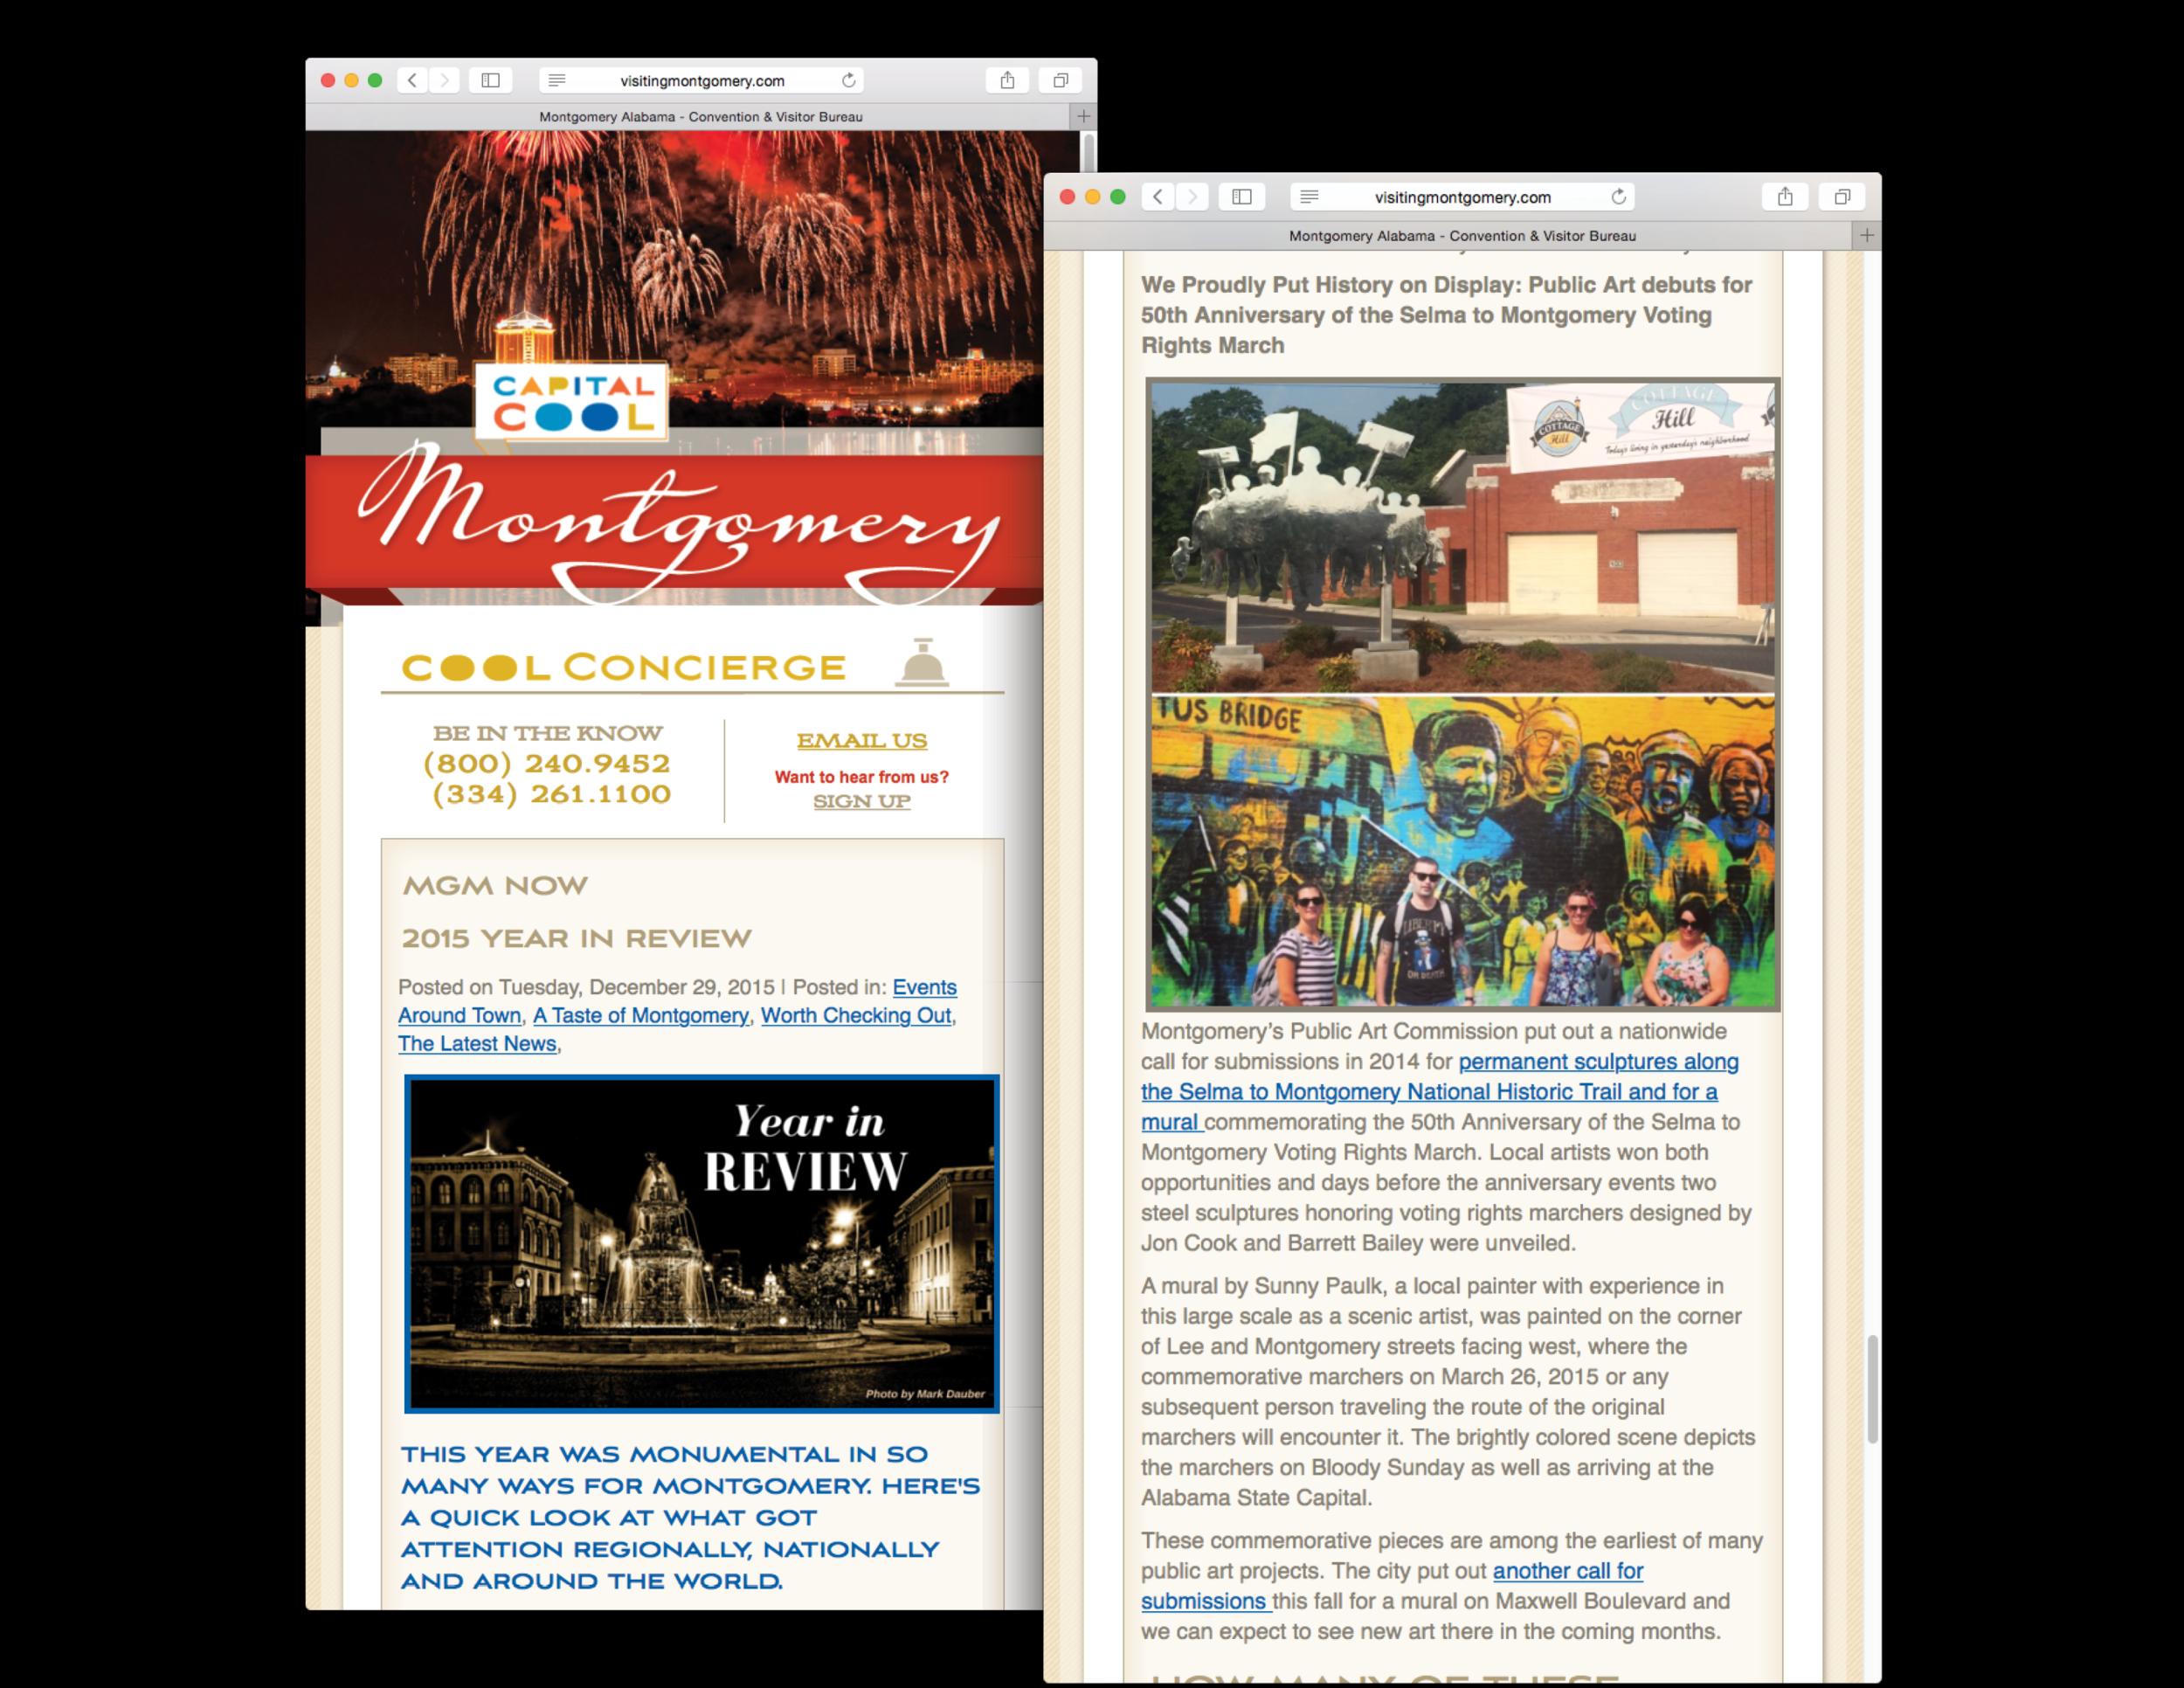 VisitMontgomery.com's 2015 Year in Review, December 29, 2015.